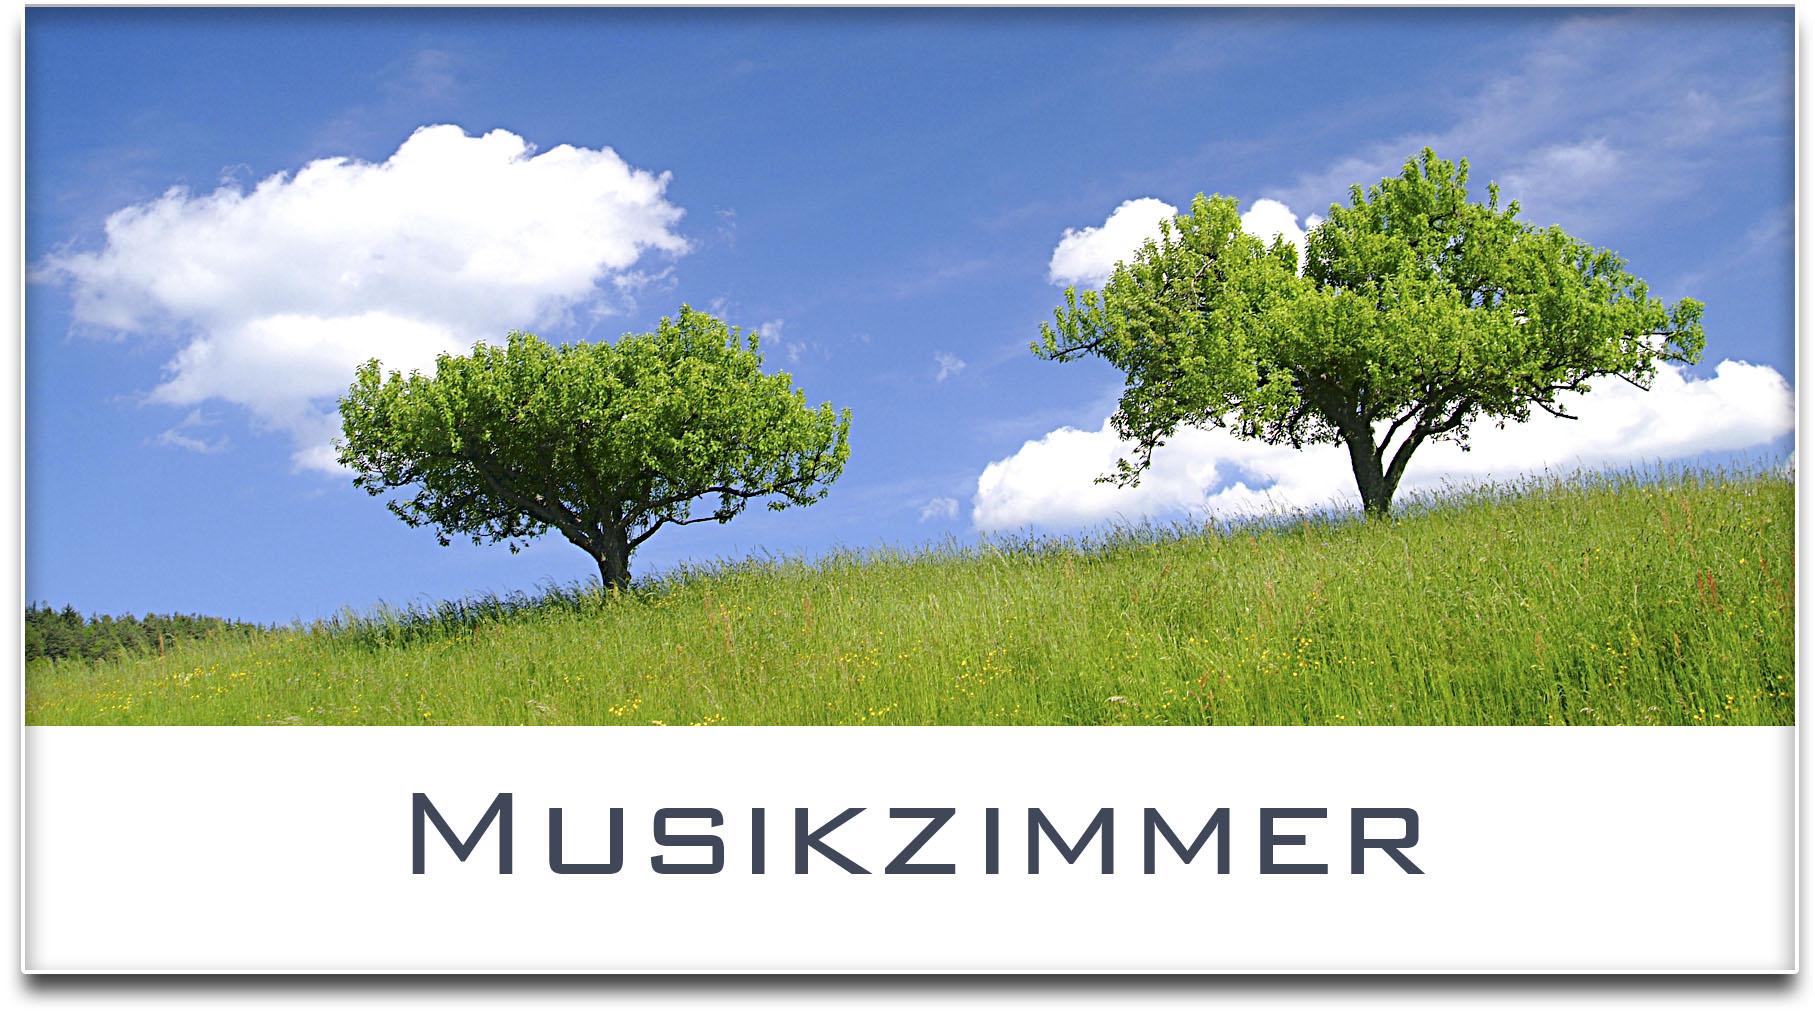 Türschild / Haustürschild / Bäume / Musikzimmer / Selbstklebend